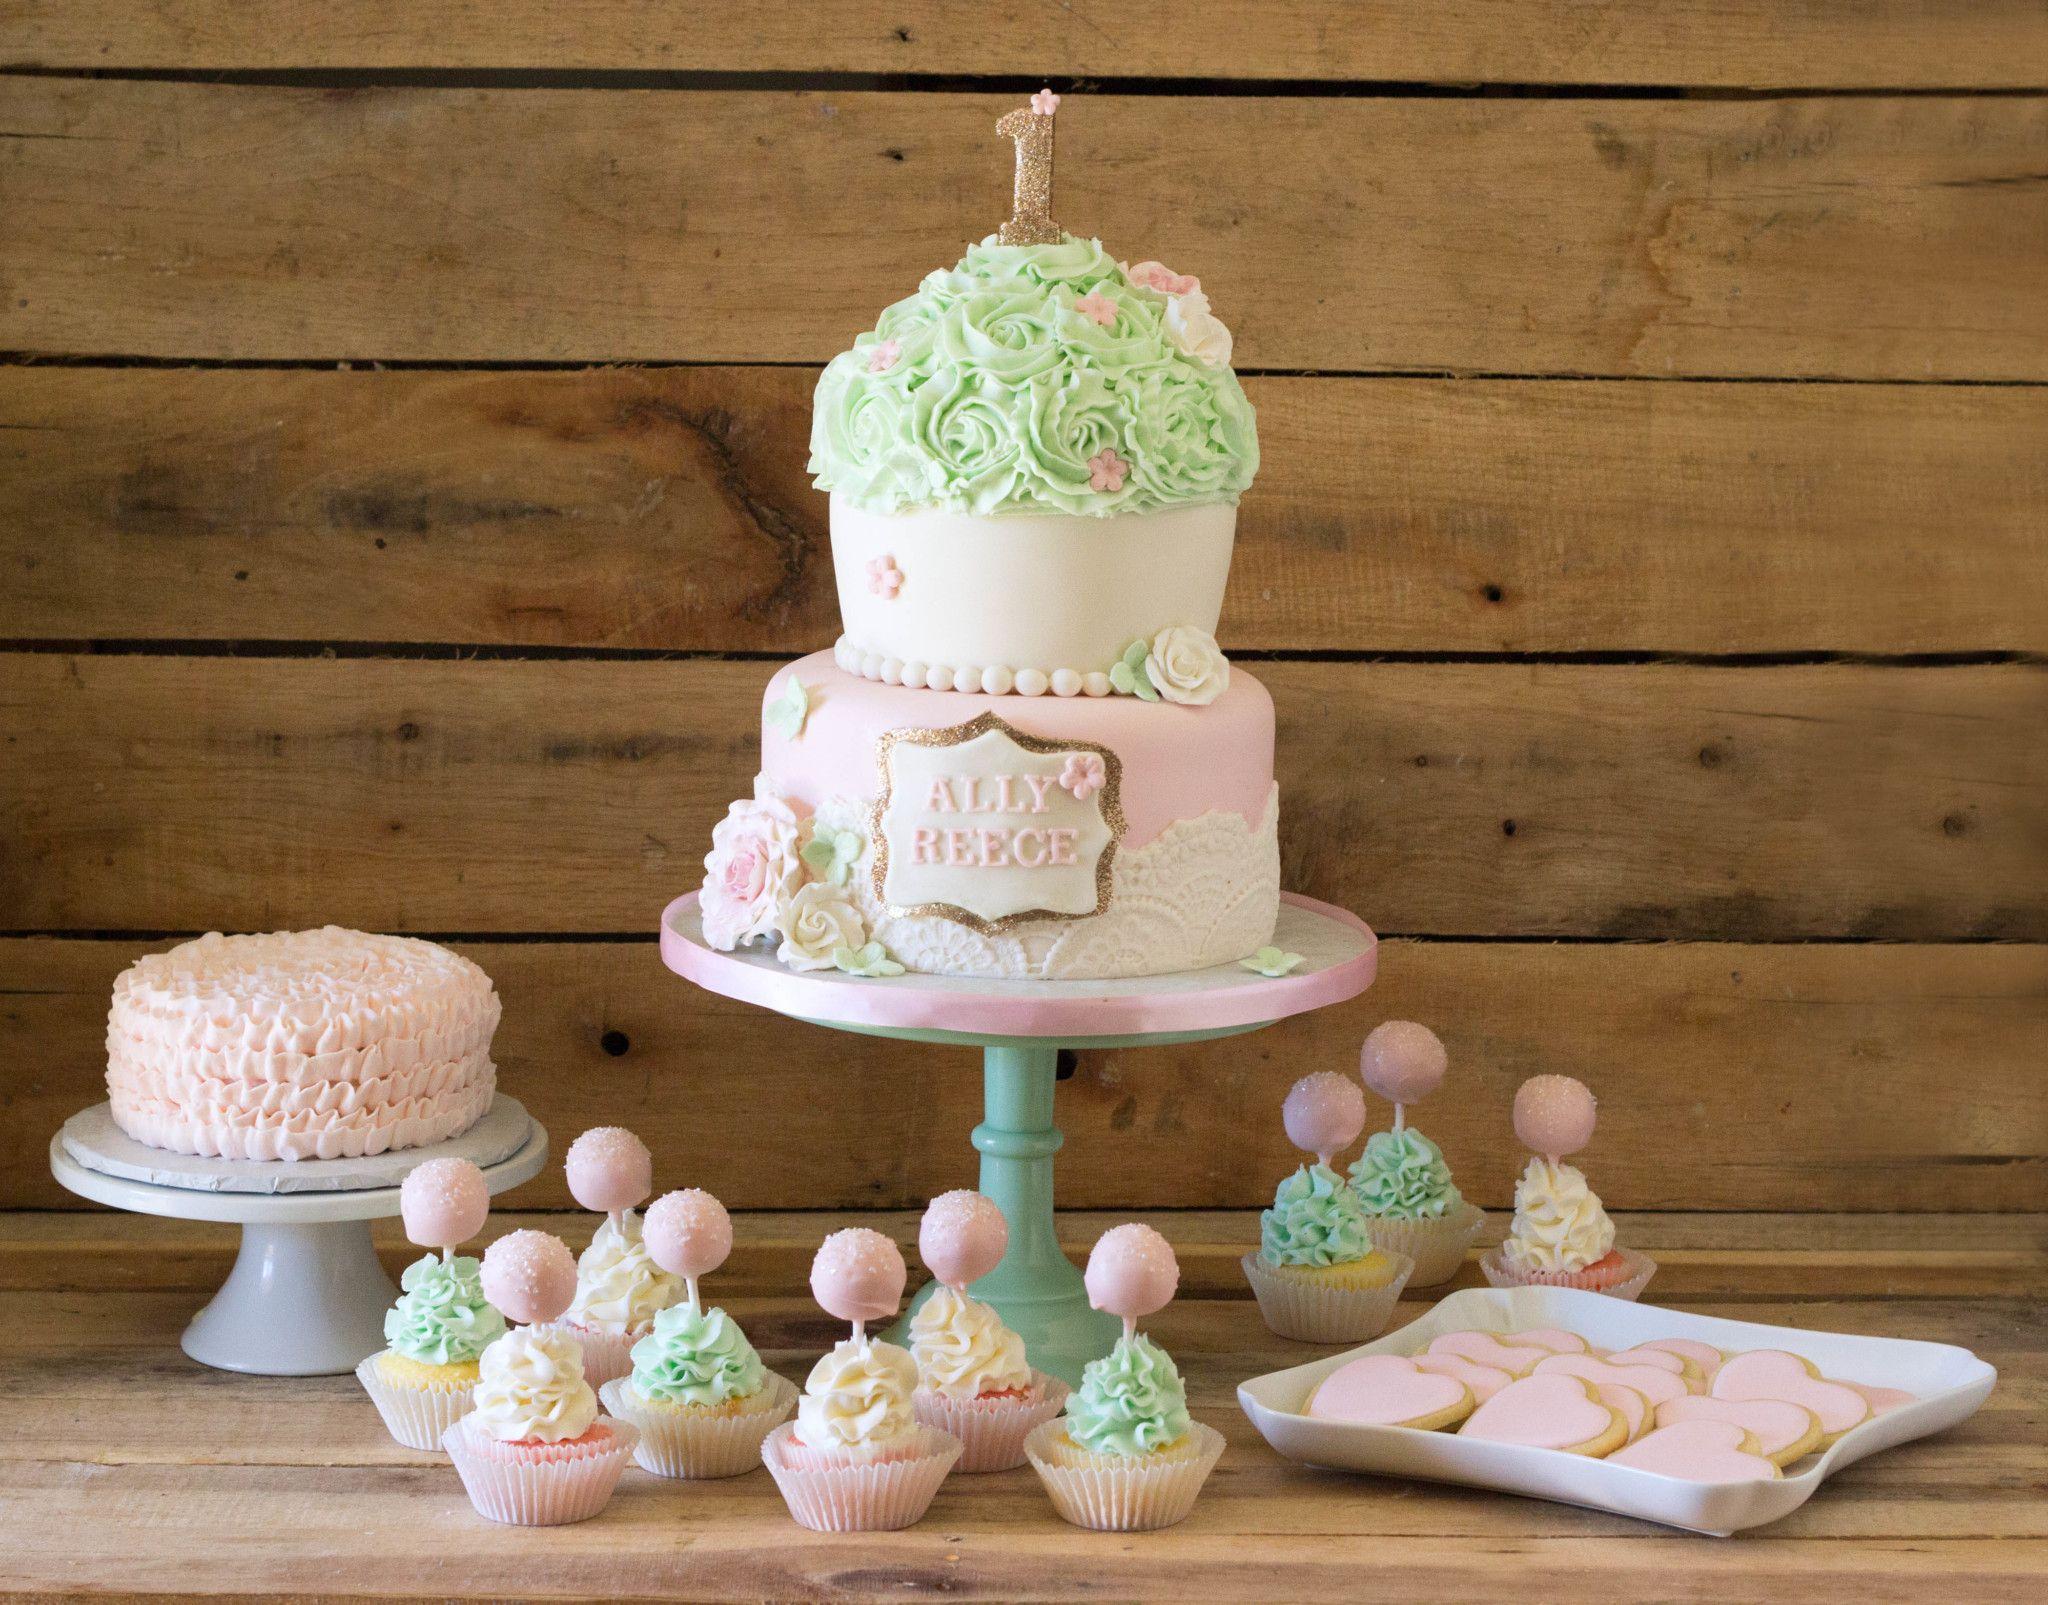 Vintage-Cupcake-Party-Cake-Cupcakes-Cookies-Smash